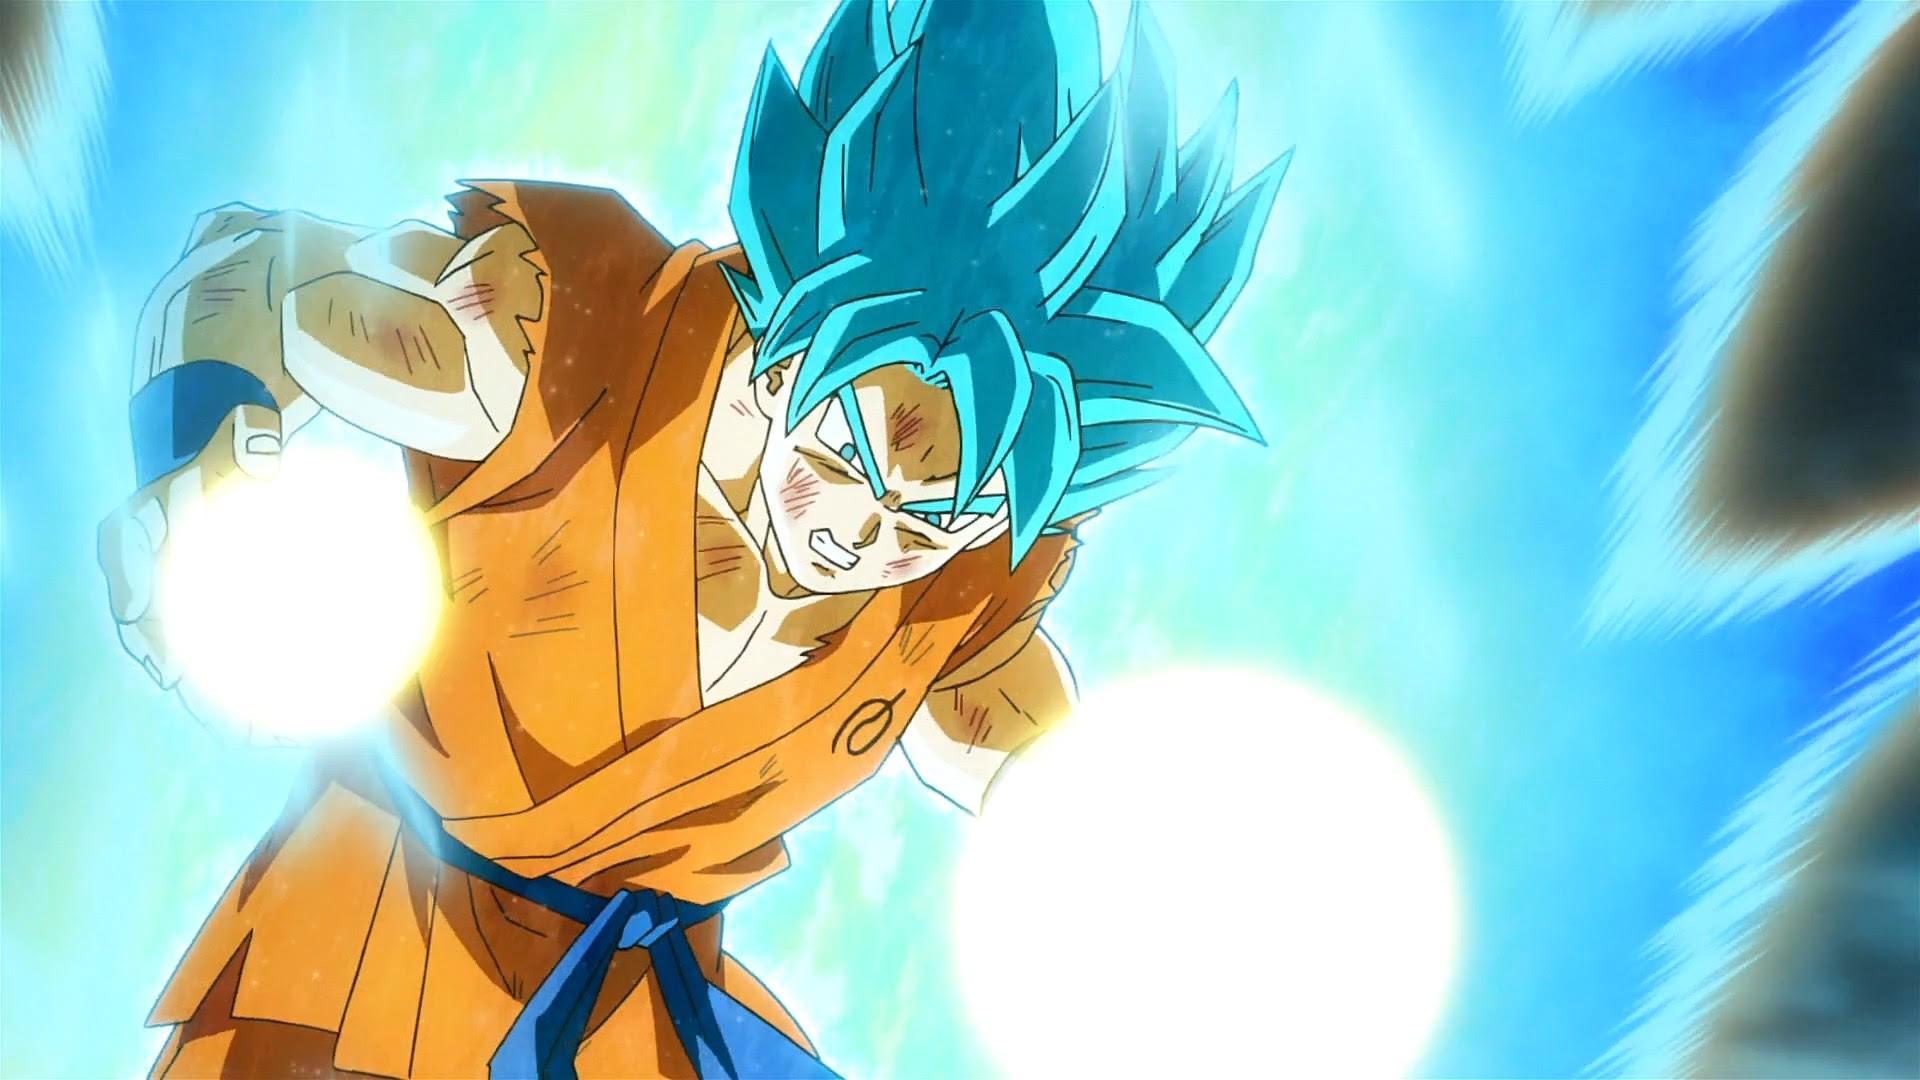 Super Saiyan God Goku Wallpaper 71 Images